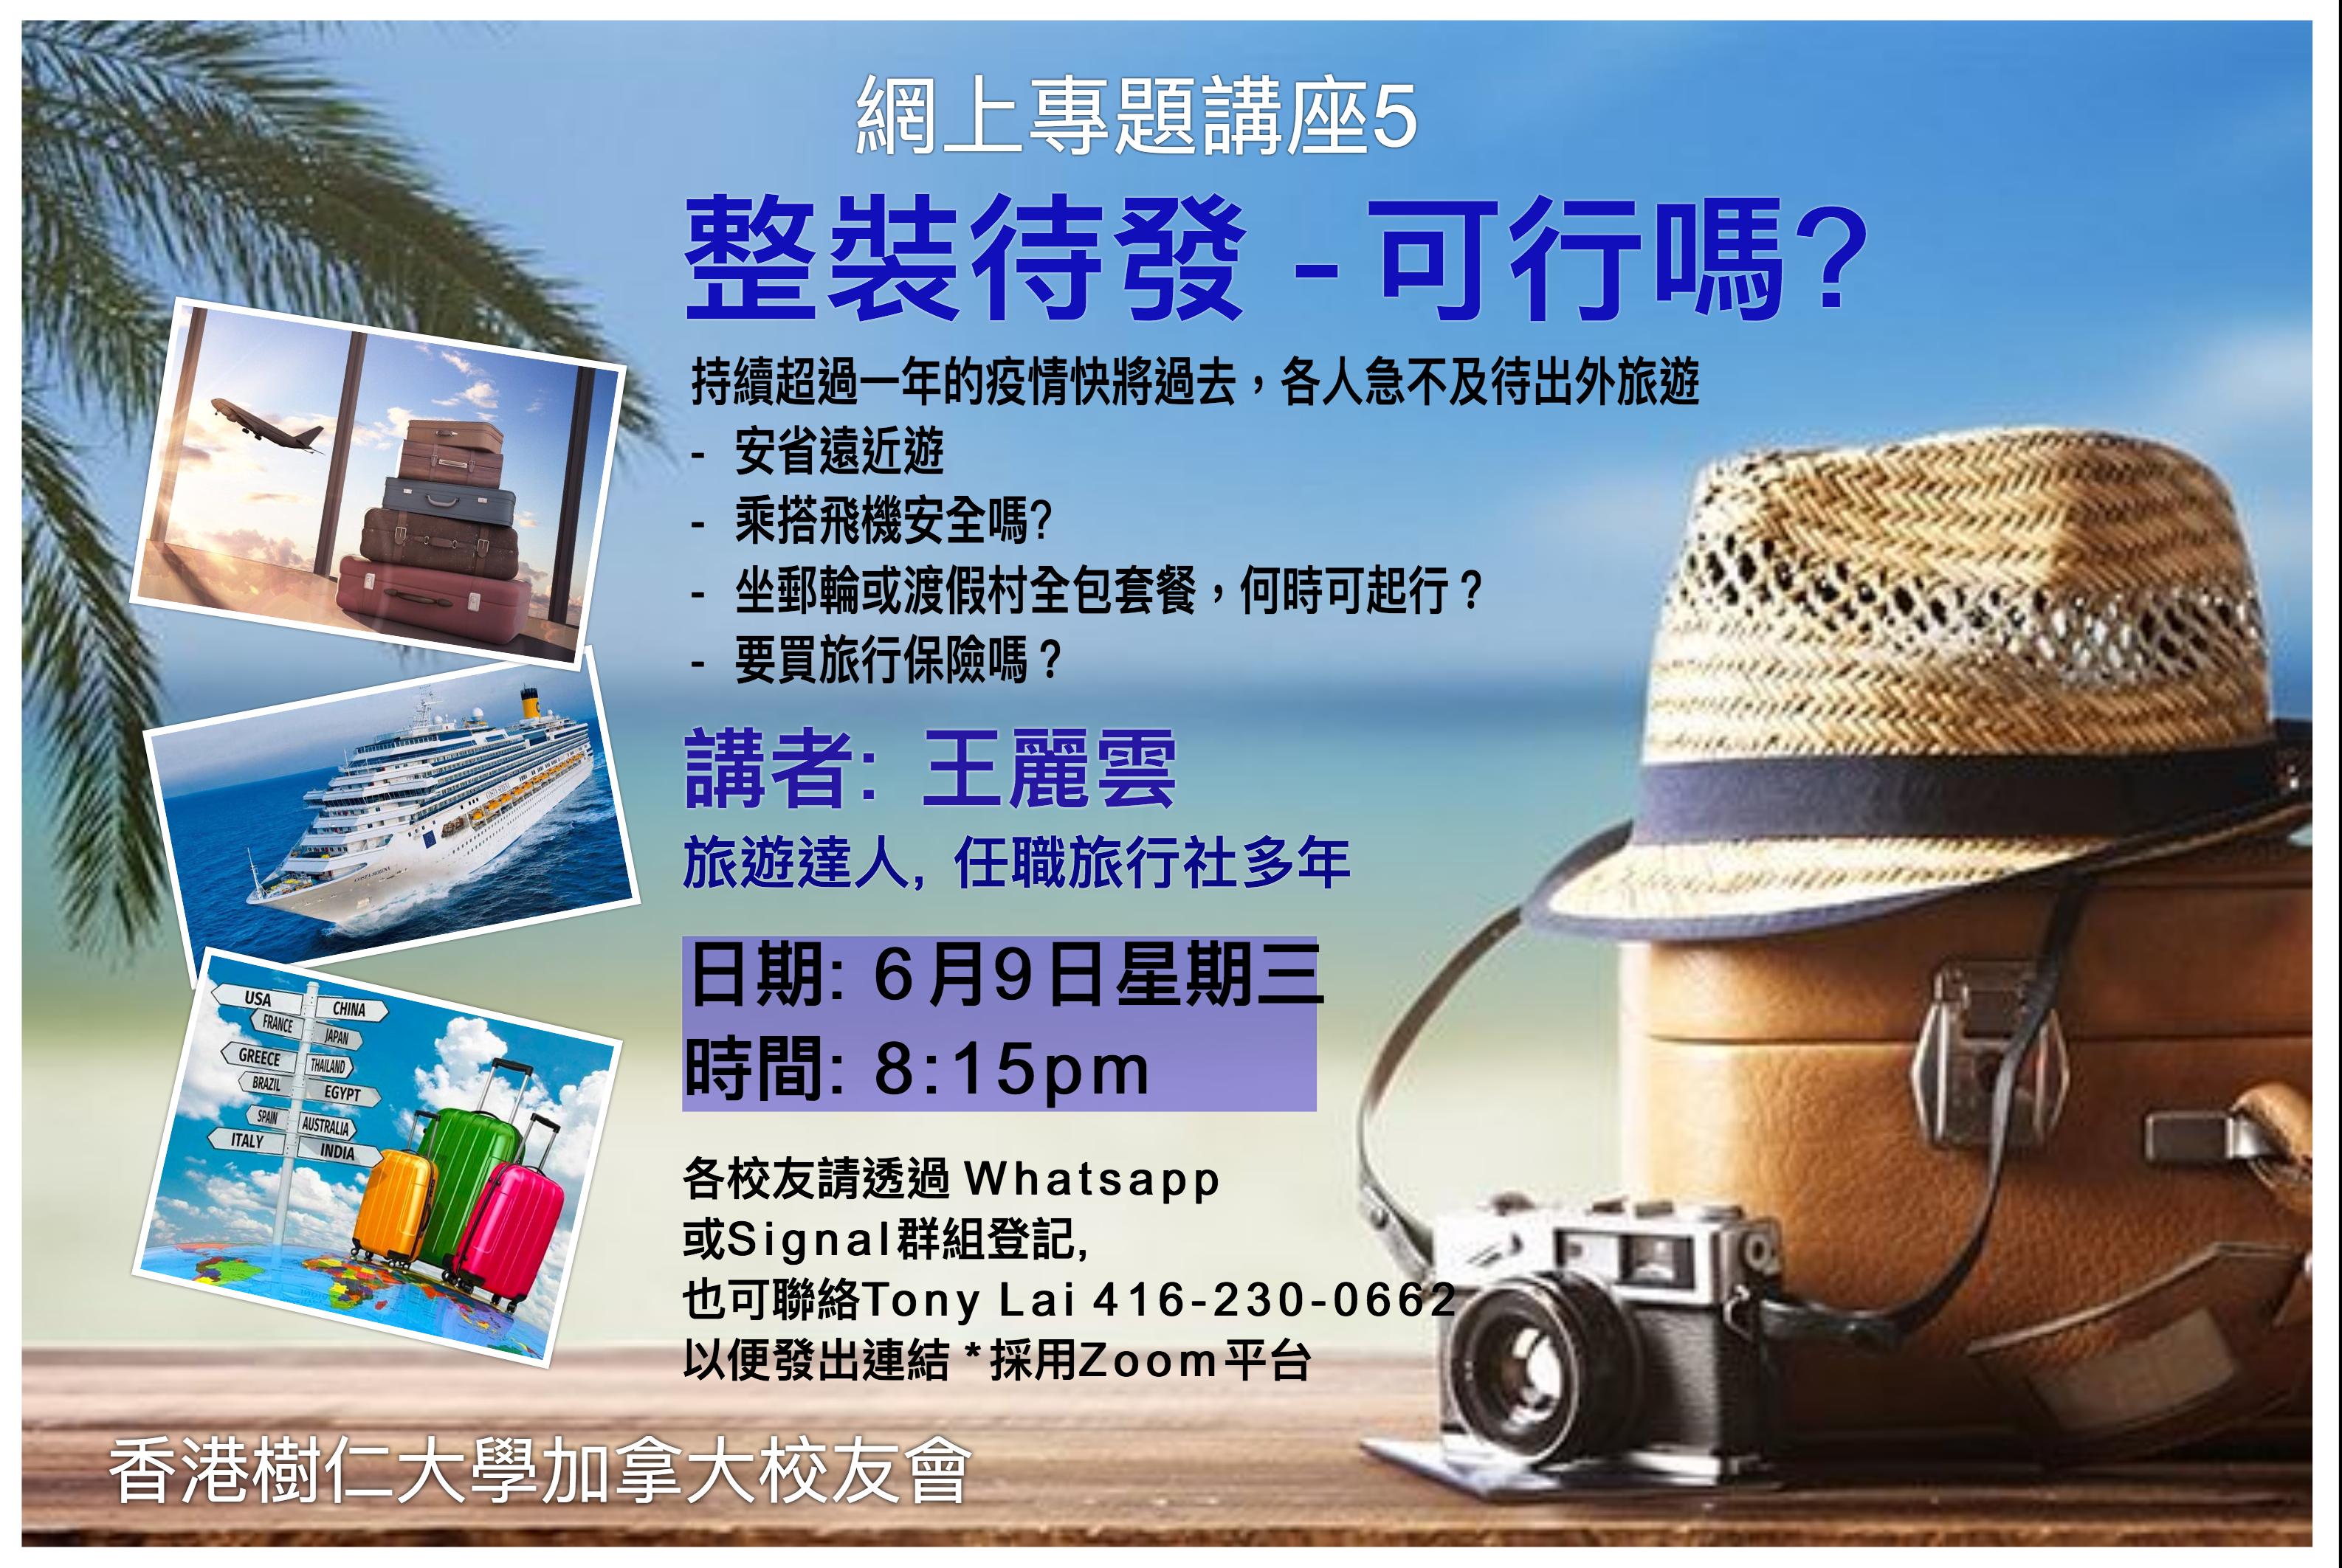 SY Webinar Travel V3